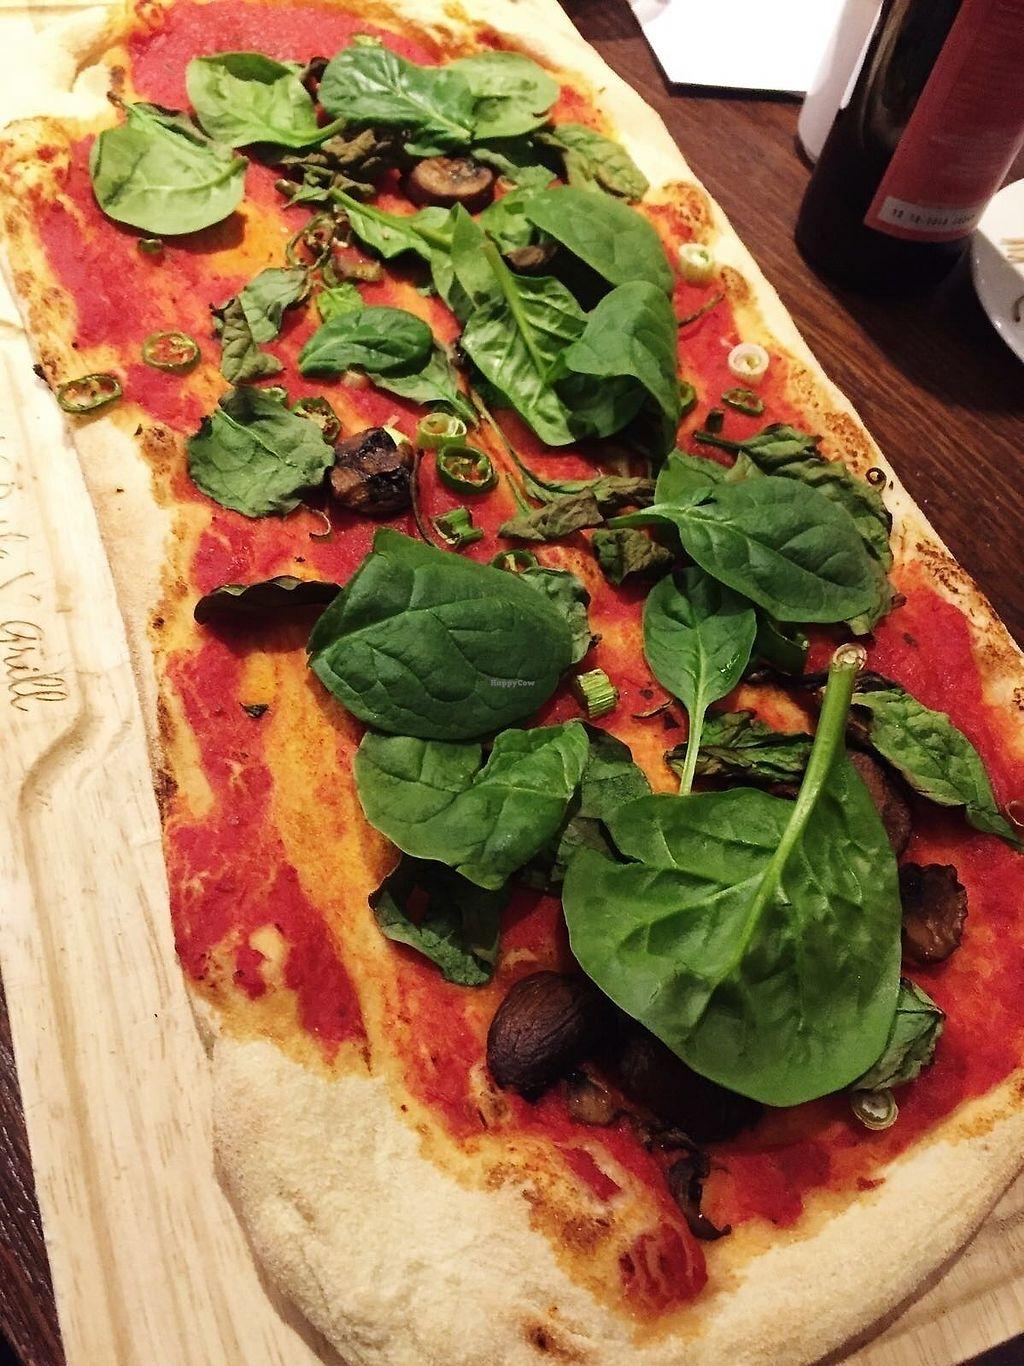 "Photo of Bella Italia  by <a href=""/members/profile/TARAMCDONALD"">TARAMCDONALD</a> <br/>Vegan pizza <br/> December 12, 2017  - <a href='/contact/abuse/image/97176/335054'>Report</a>"